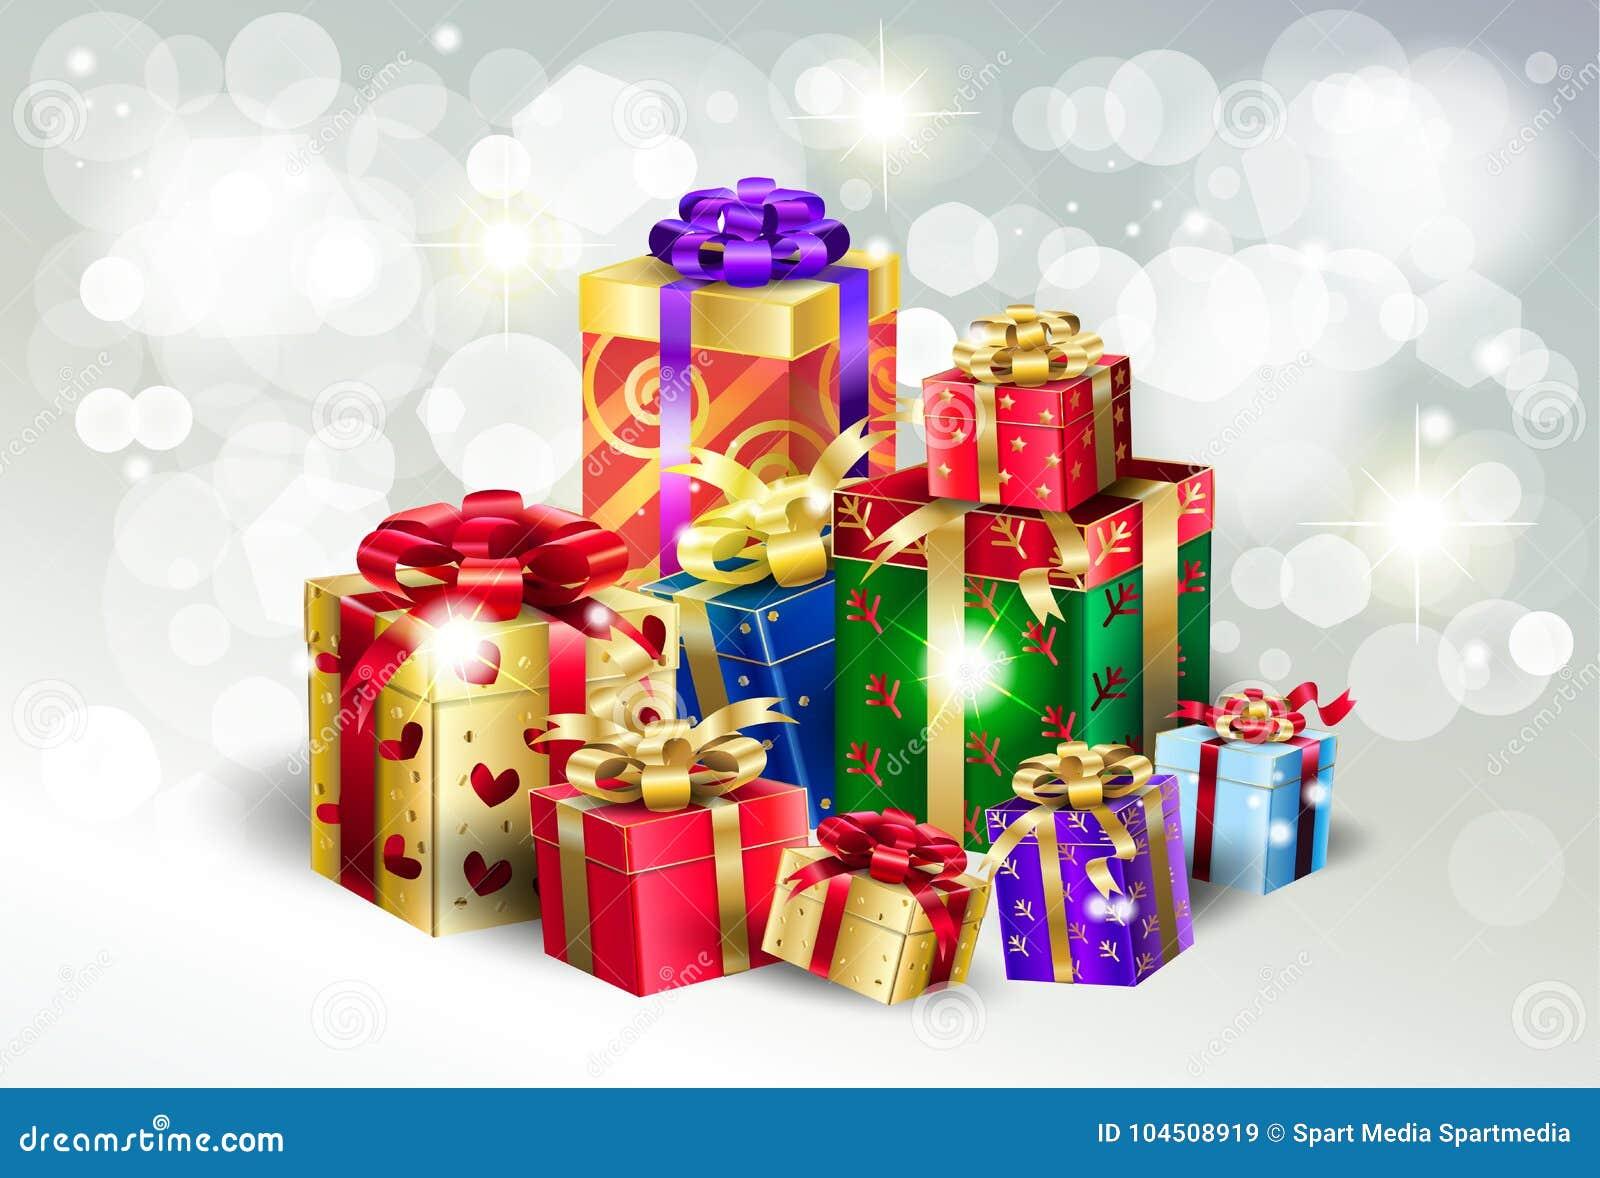 Christmas Gift Boxes Silver Bokeh Lights Wallpaper Stock Vector Illustration Of Event Fireworks 104508919